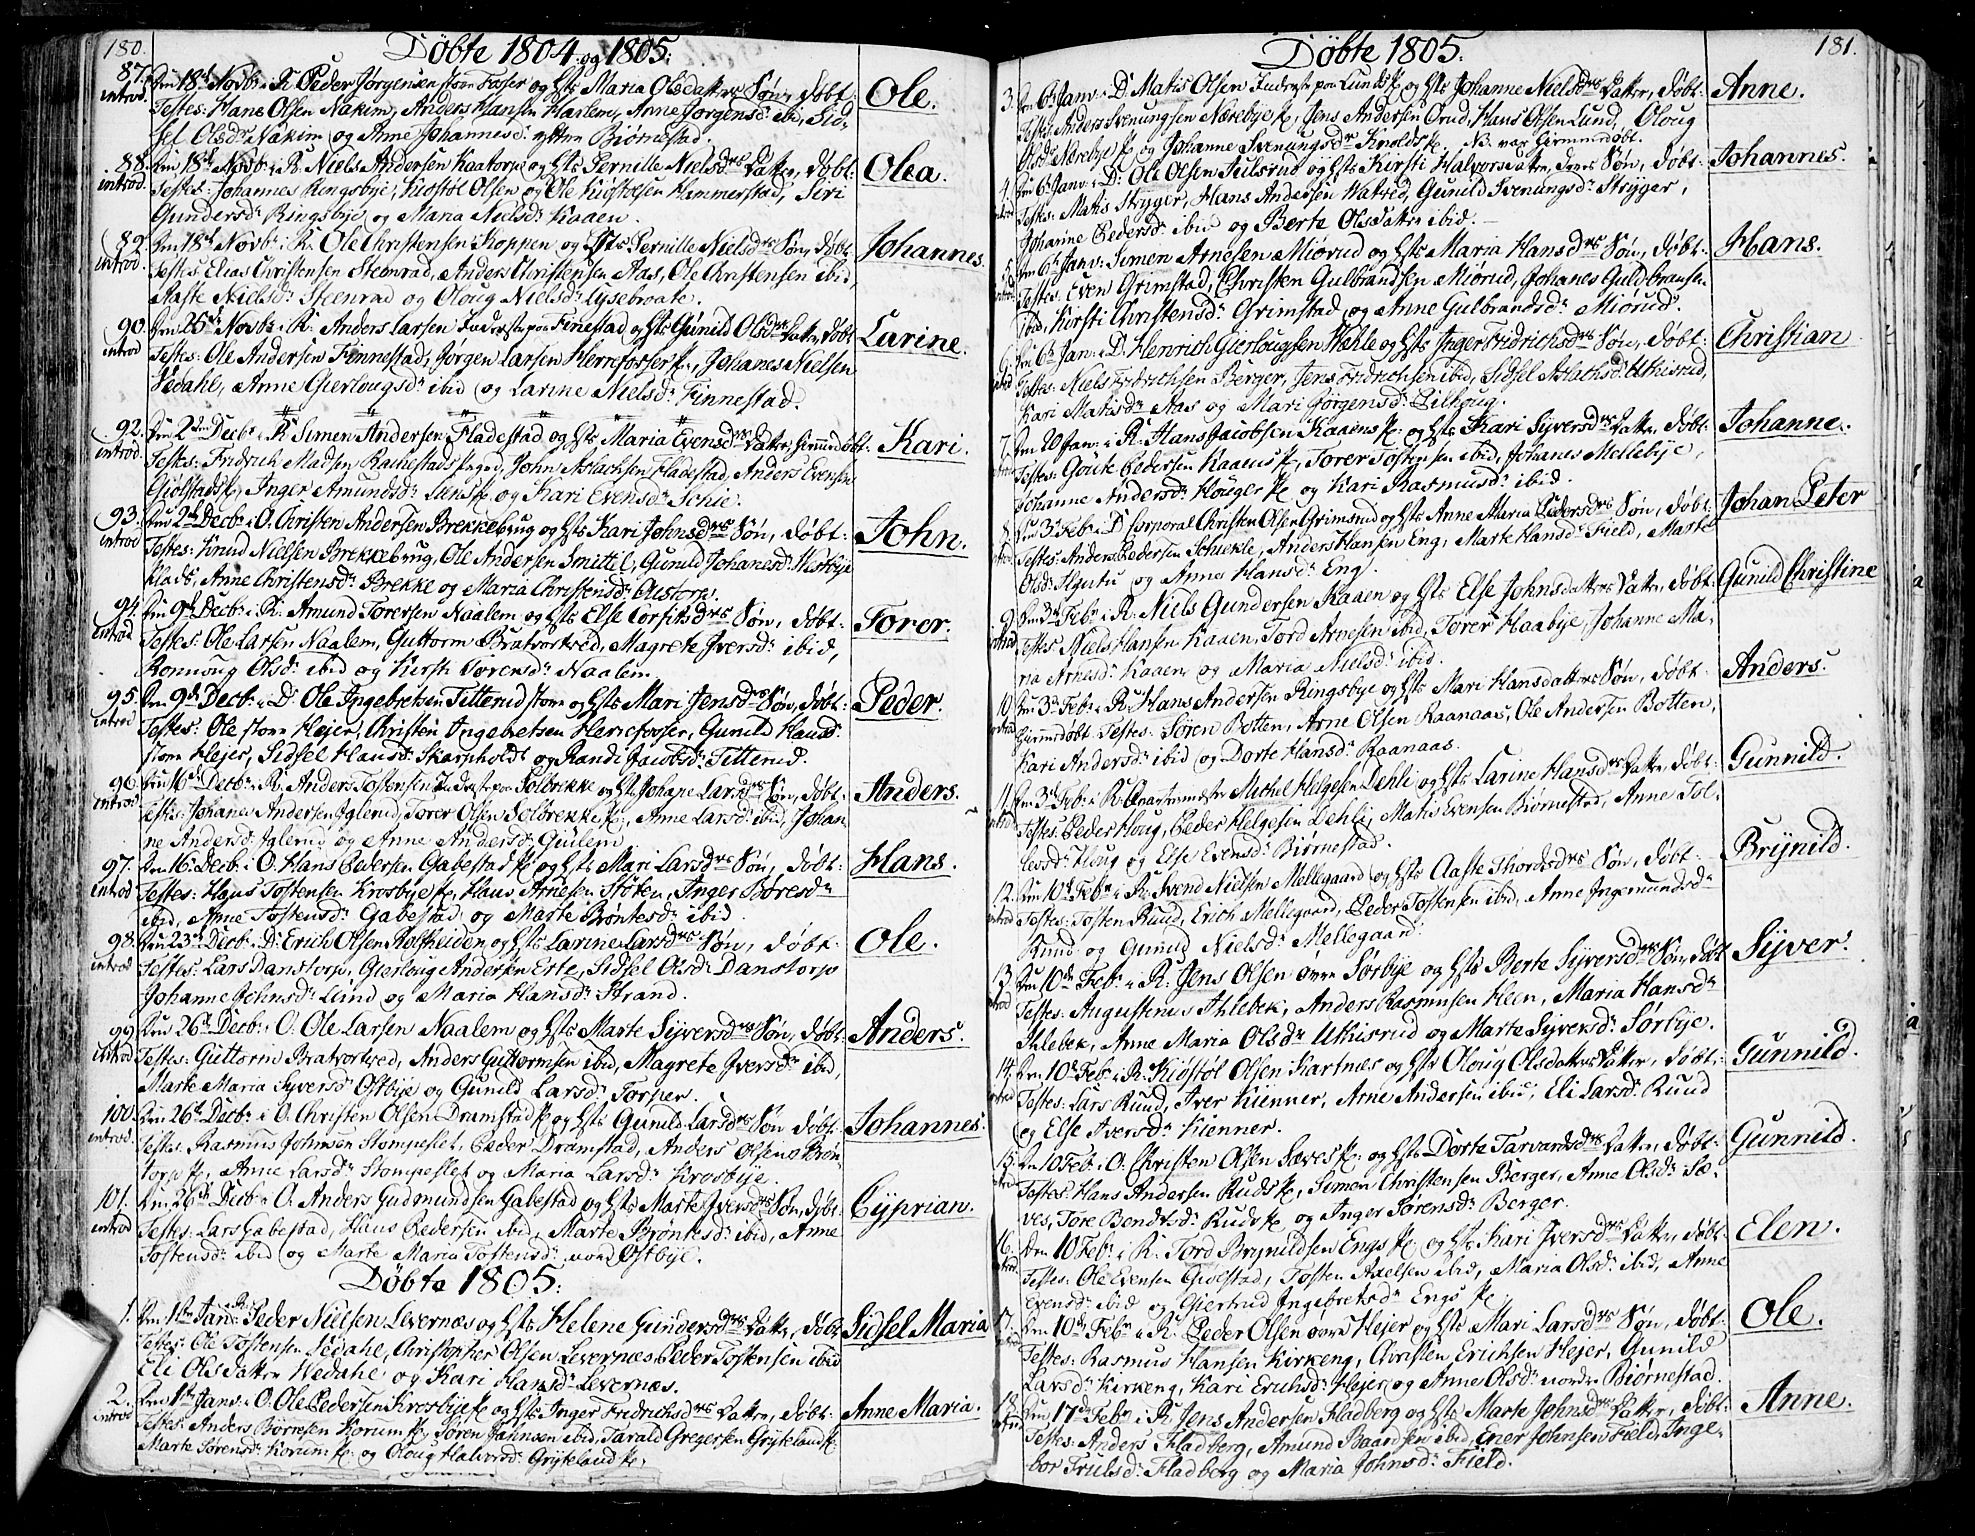 SAO, Rakkestad prestekontor Kirkebøker, F/Fa/L0005: Ministerialbok nr. I 5, 1784-1814, s. 180-181